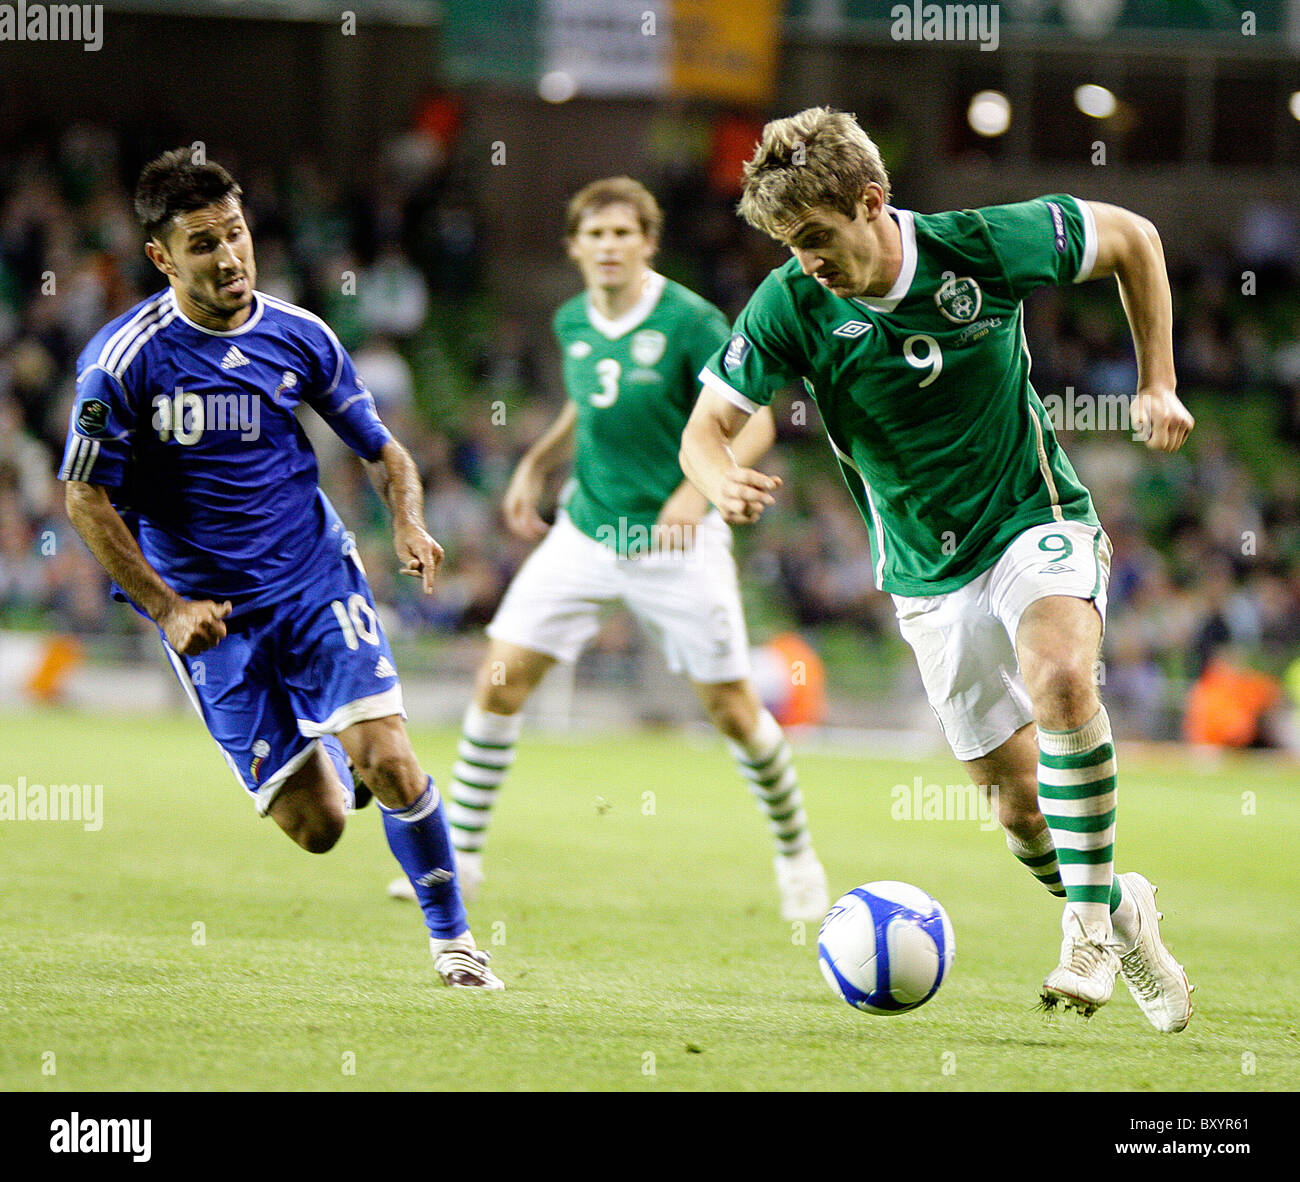 Manel Jimenez, of Andorra in action against Kevin Doyle, Republic of Ireland. Rep of Ireland Vs Andorra - Stock Image